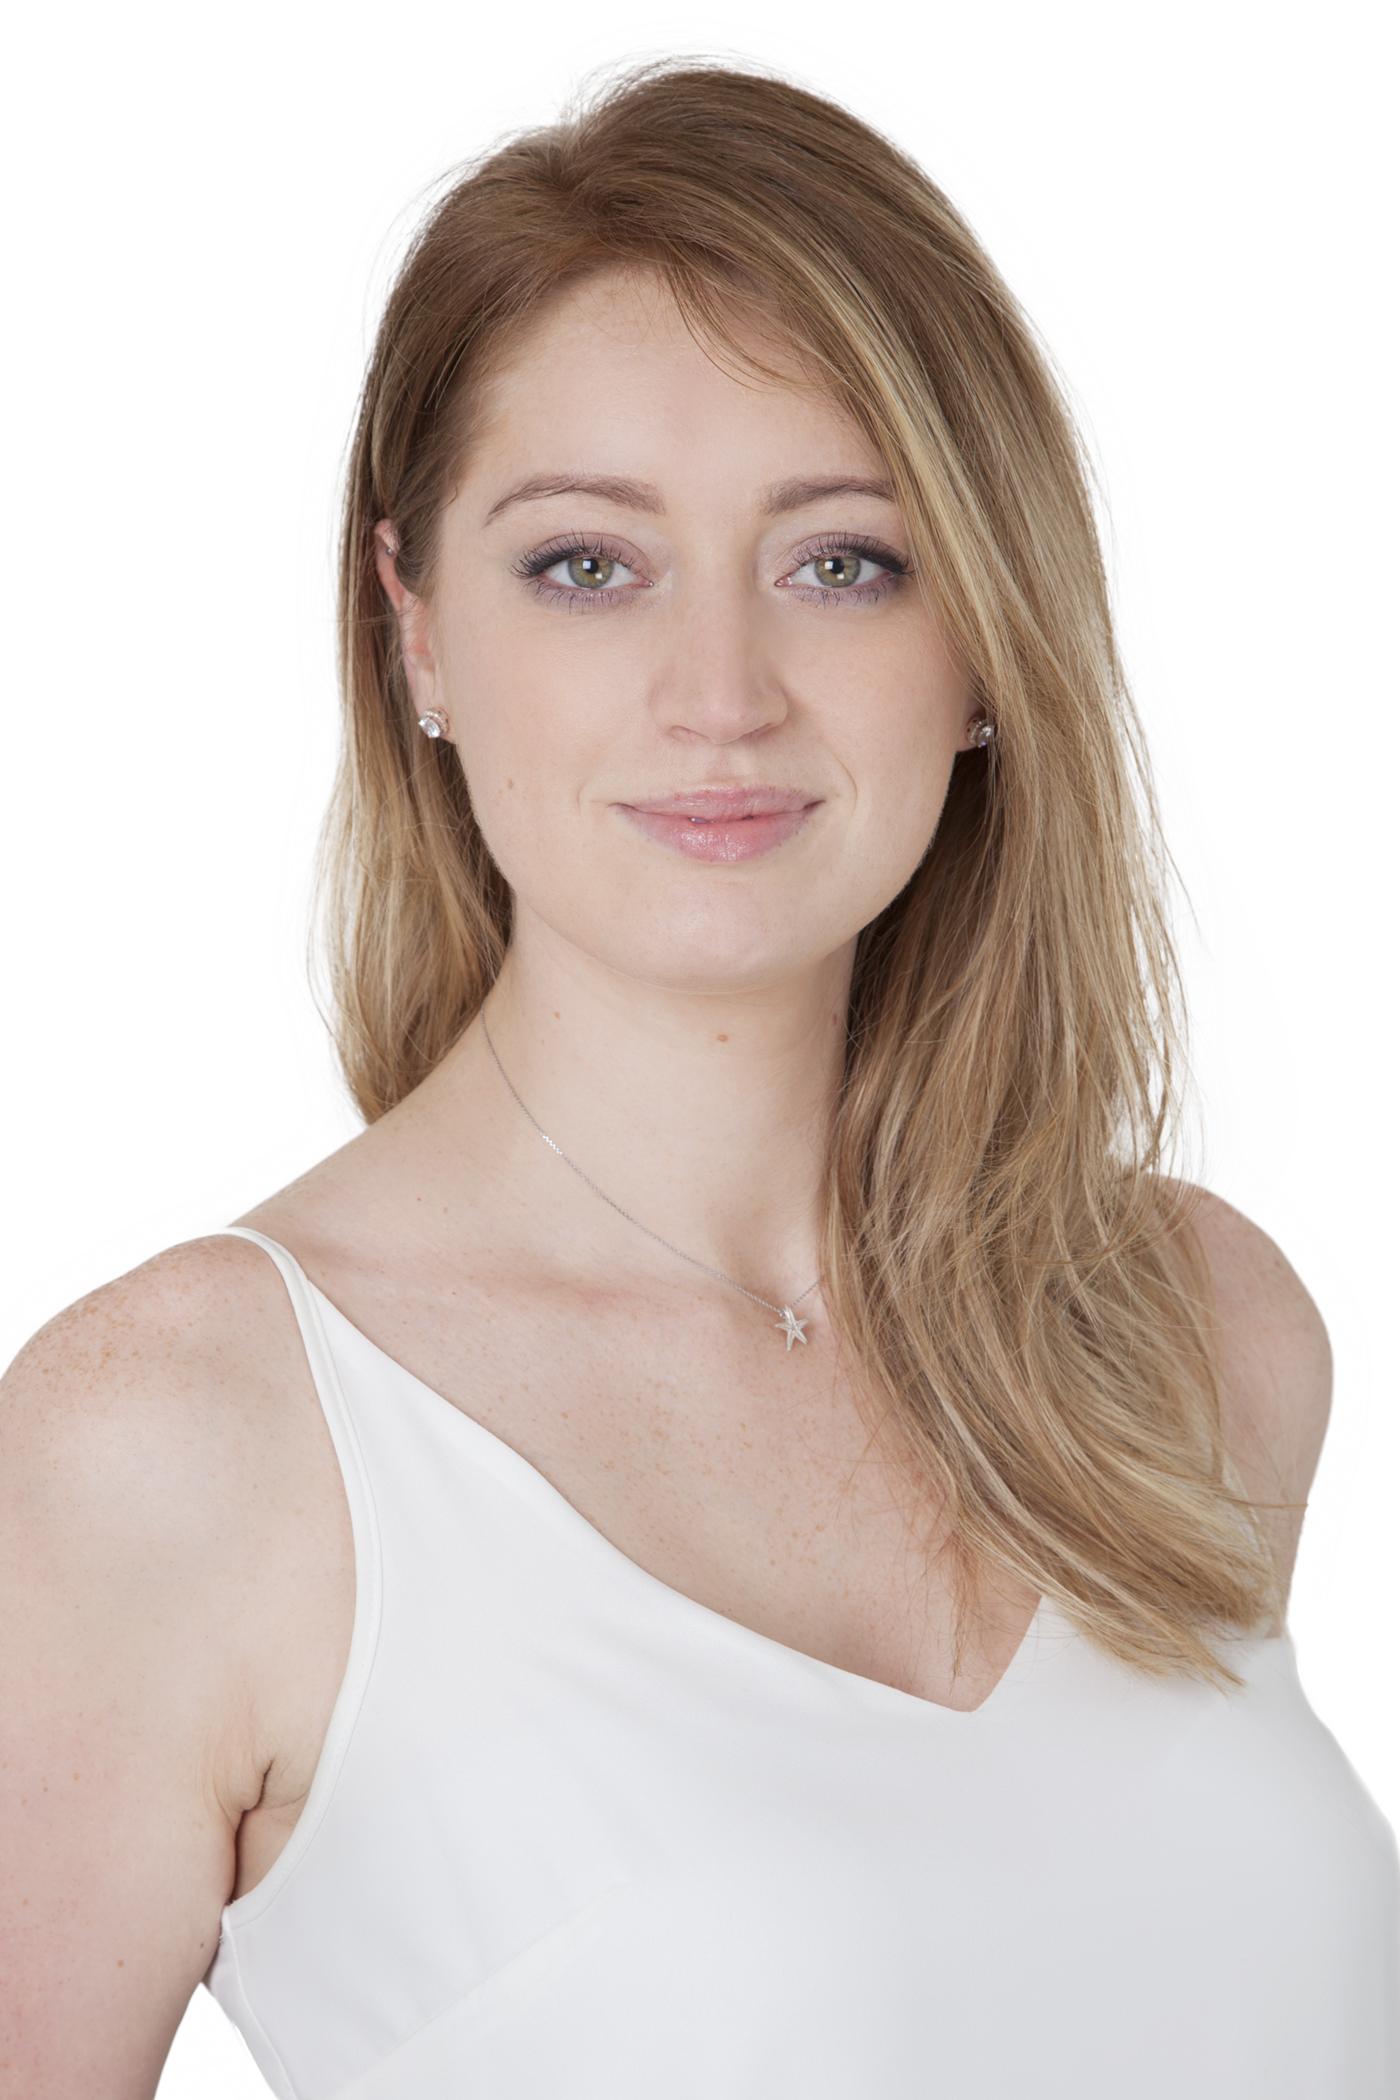 Headshot of woman on white background smiles to camera